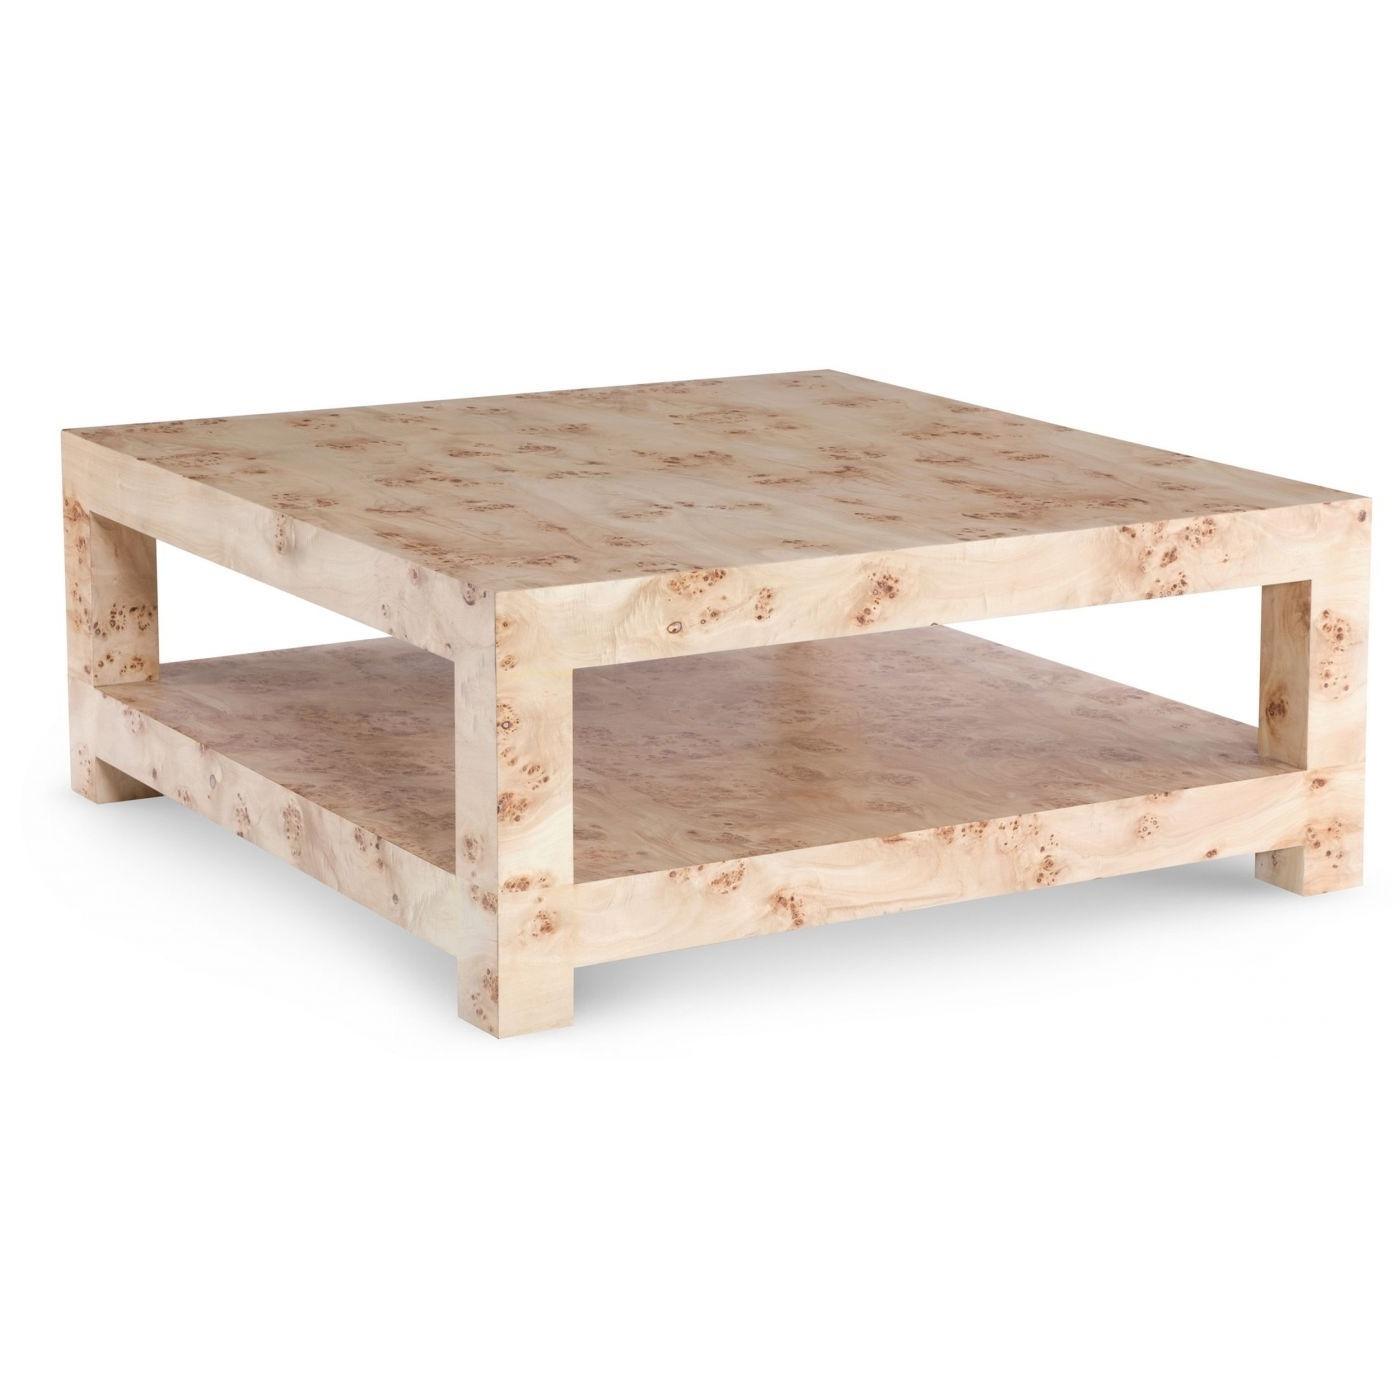 Bi Level Square Coffee Table In Mapa Burl Wood Vaneer (View 10 of 20)